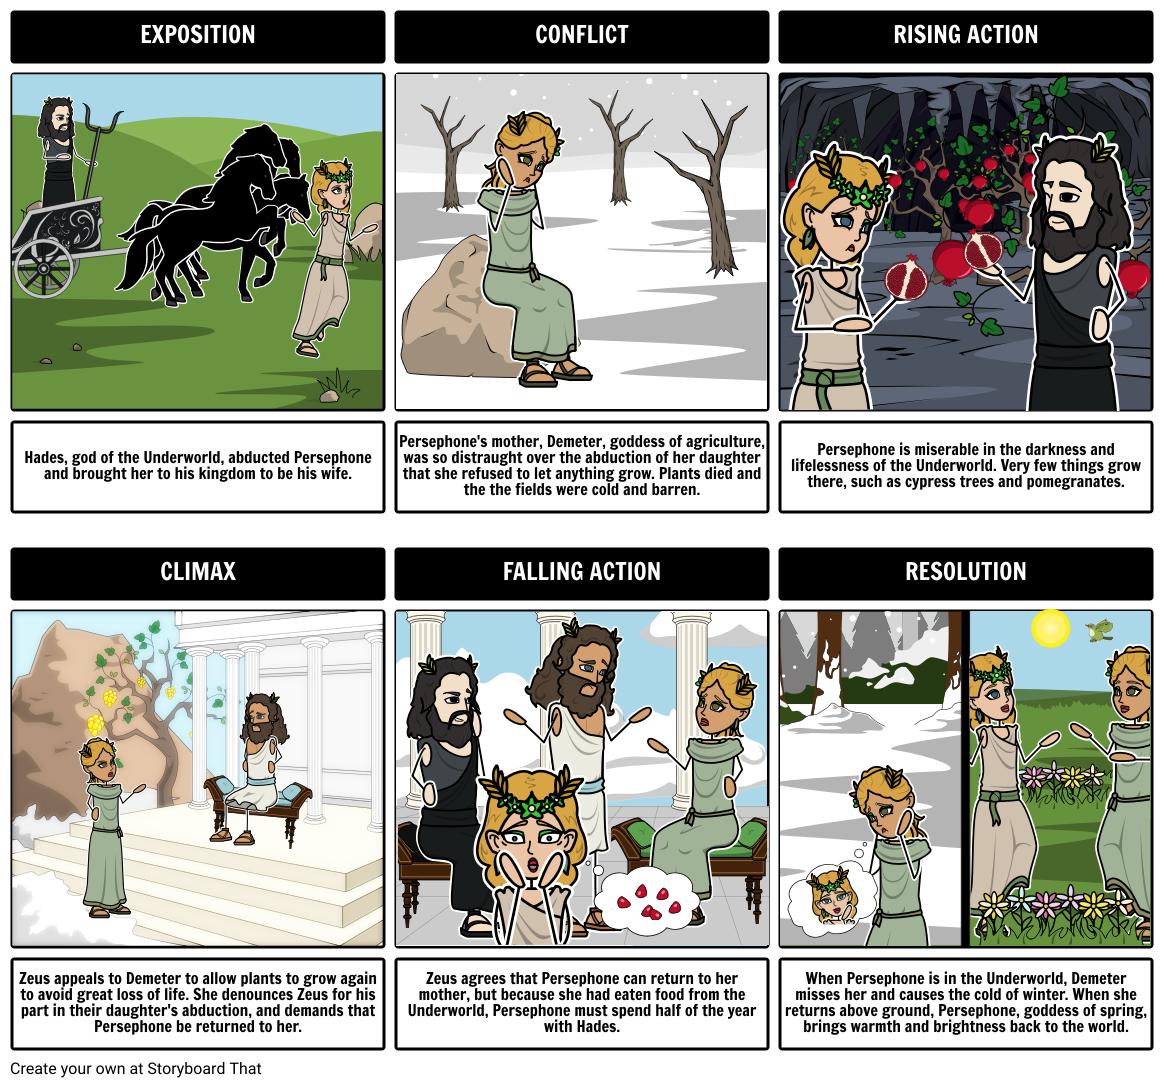 Hades and persephone myth plot diagram students can create a hades and persephone myth plot diagram students can create a storyboard capturing the narrative arc pooptronica